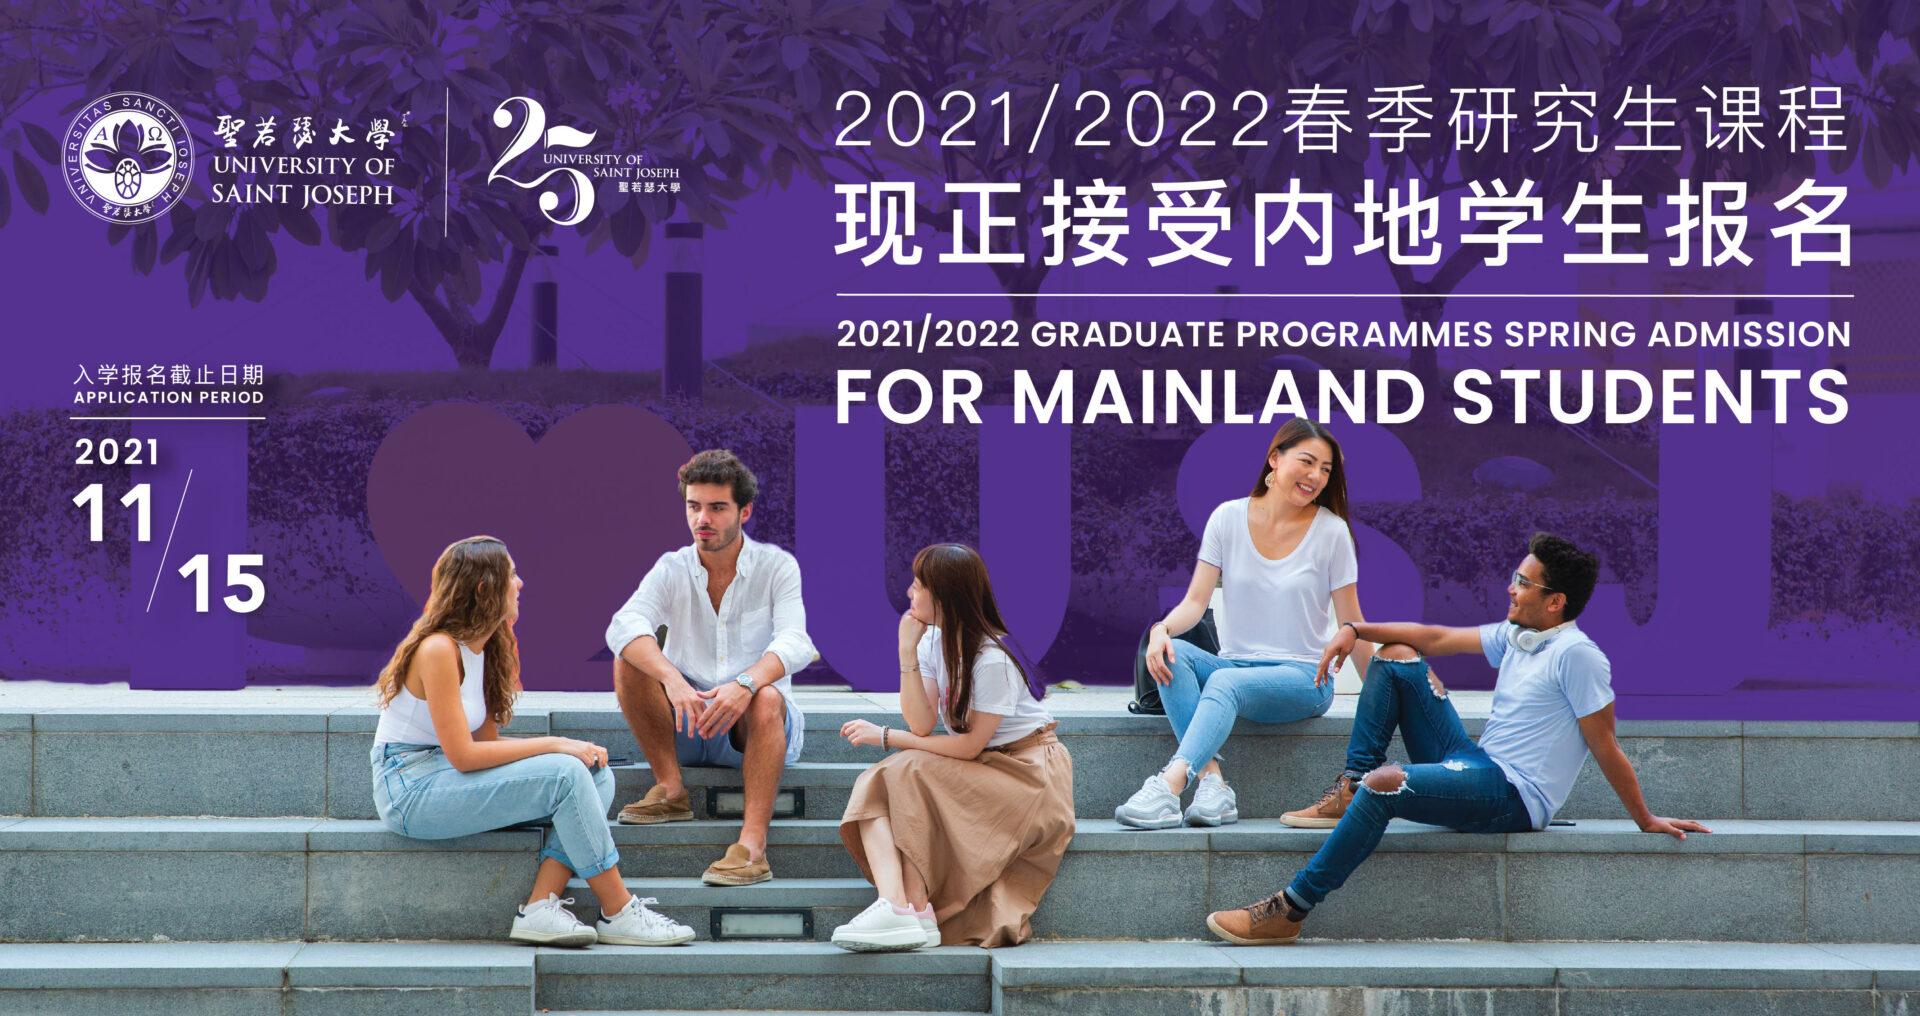 Mainland Students